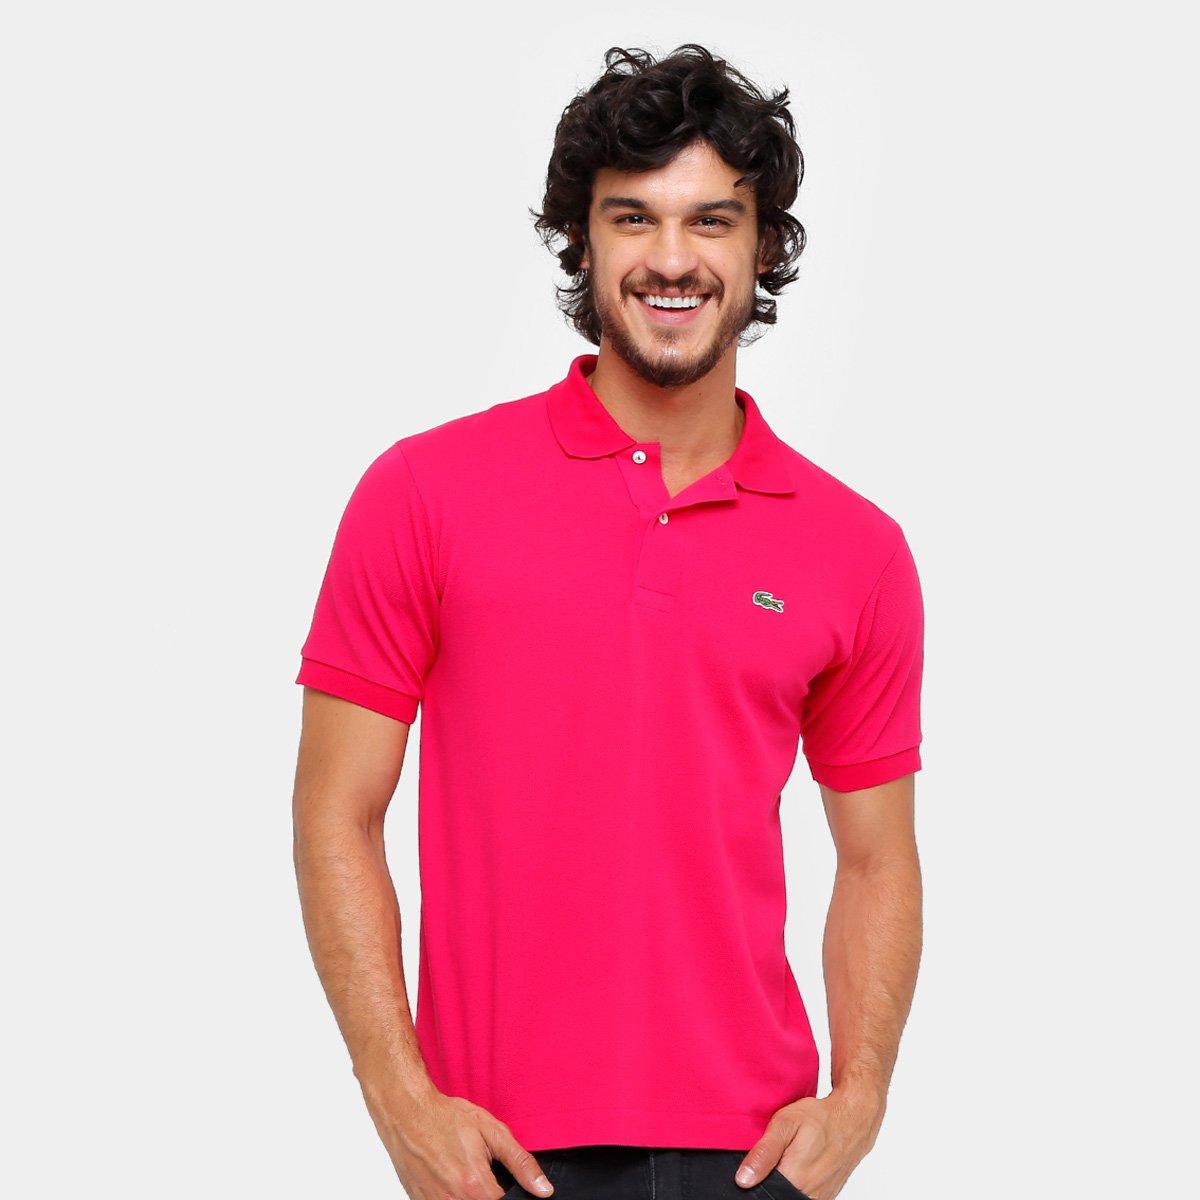 abec08e715 Camisa Polo Lacoste Piquet Original Fit Masculina - Pink - Compre Agora